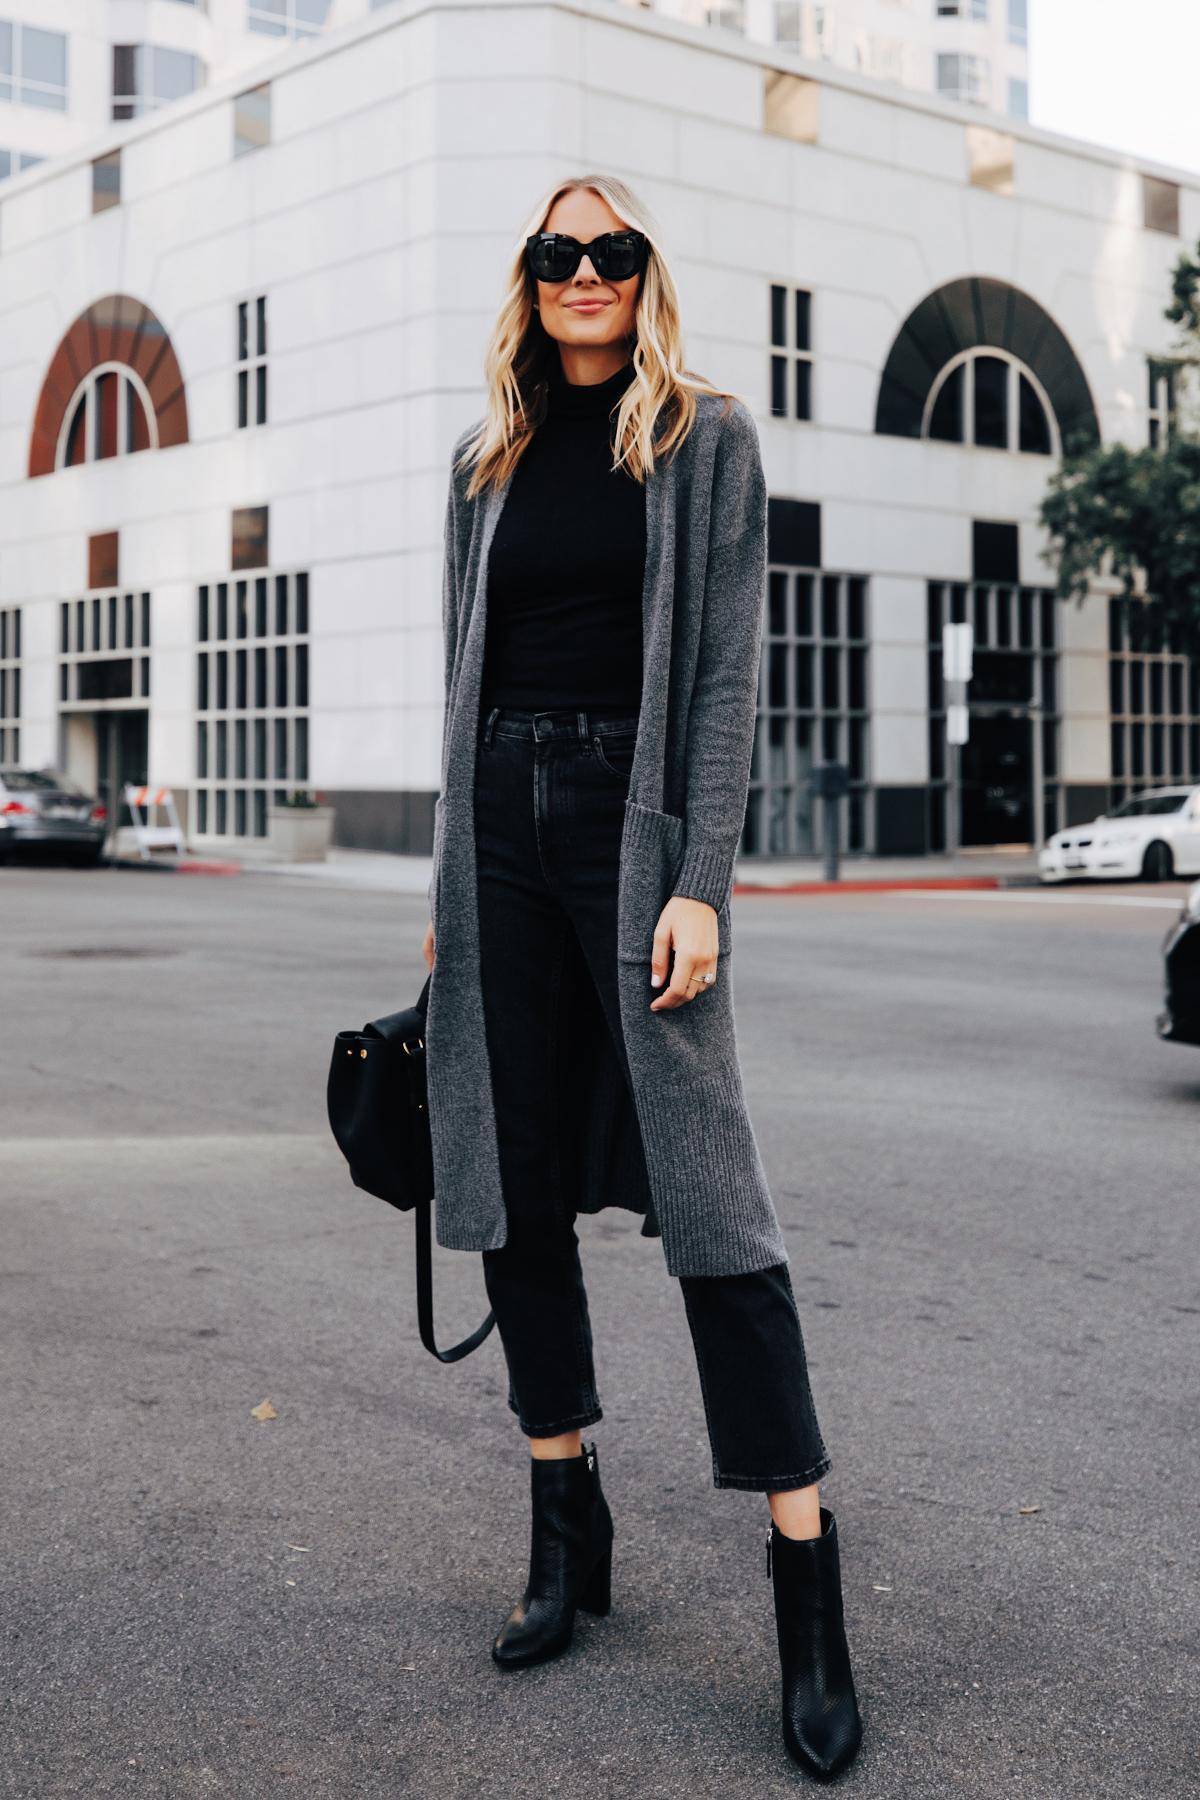 Fashion Jackson Wearing Walmart Scoop Long Grey Cardigan Black Top Black Jeans Black Snakeskin Booties 1